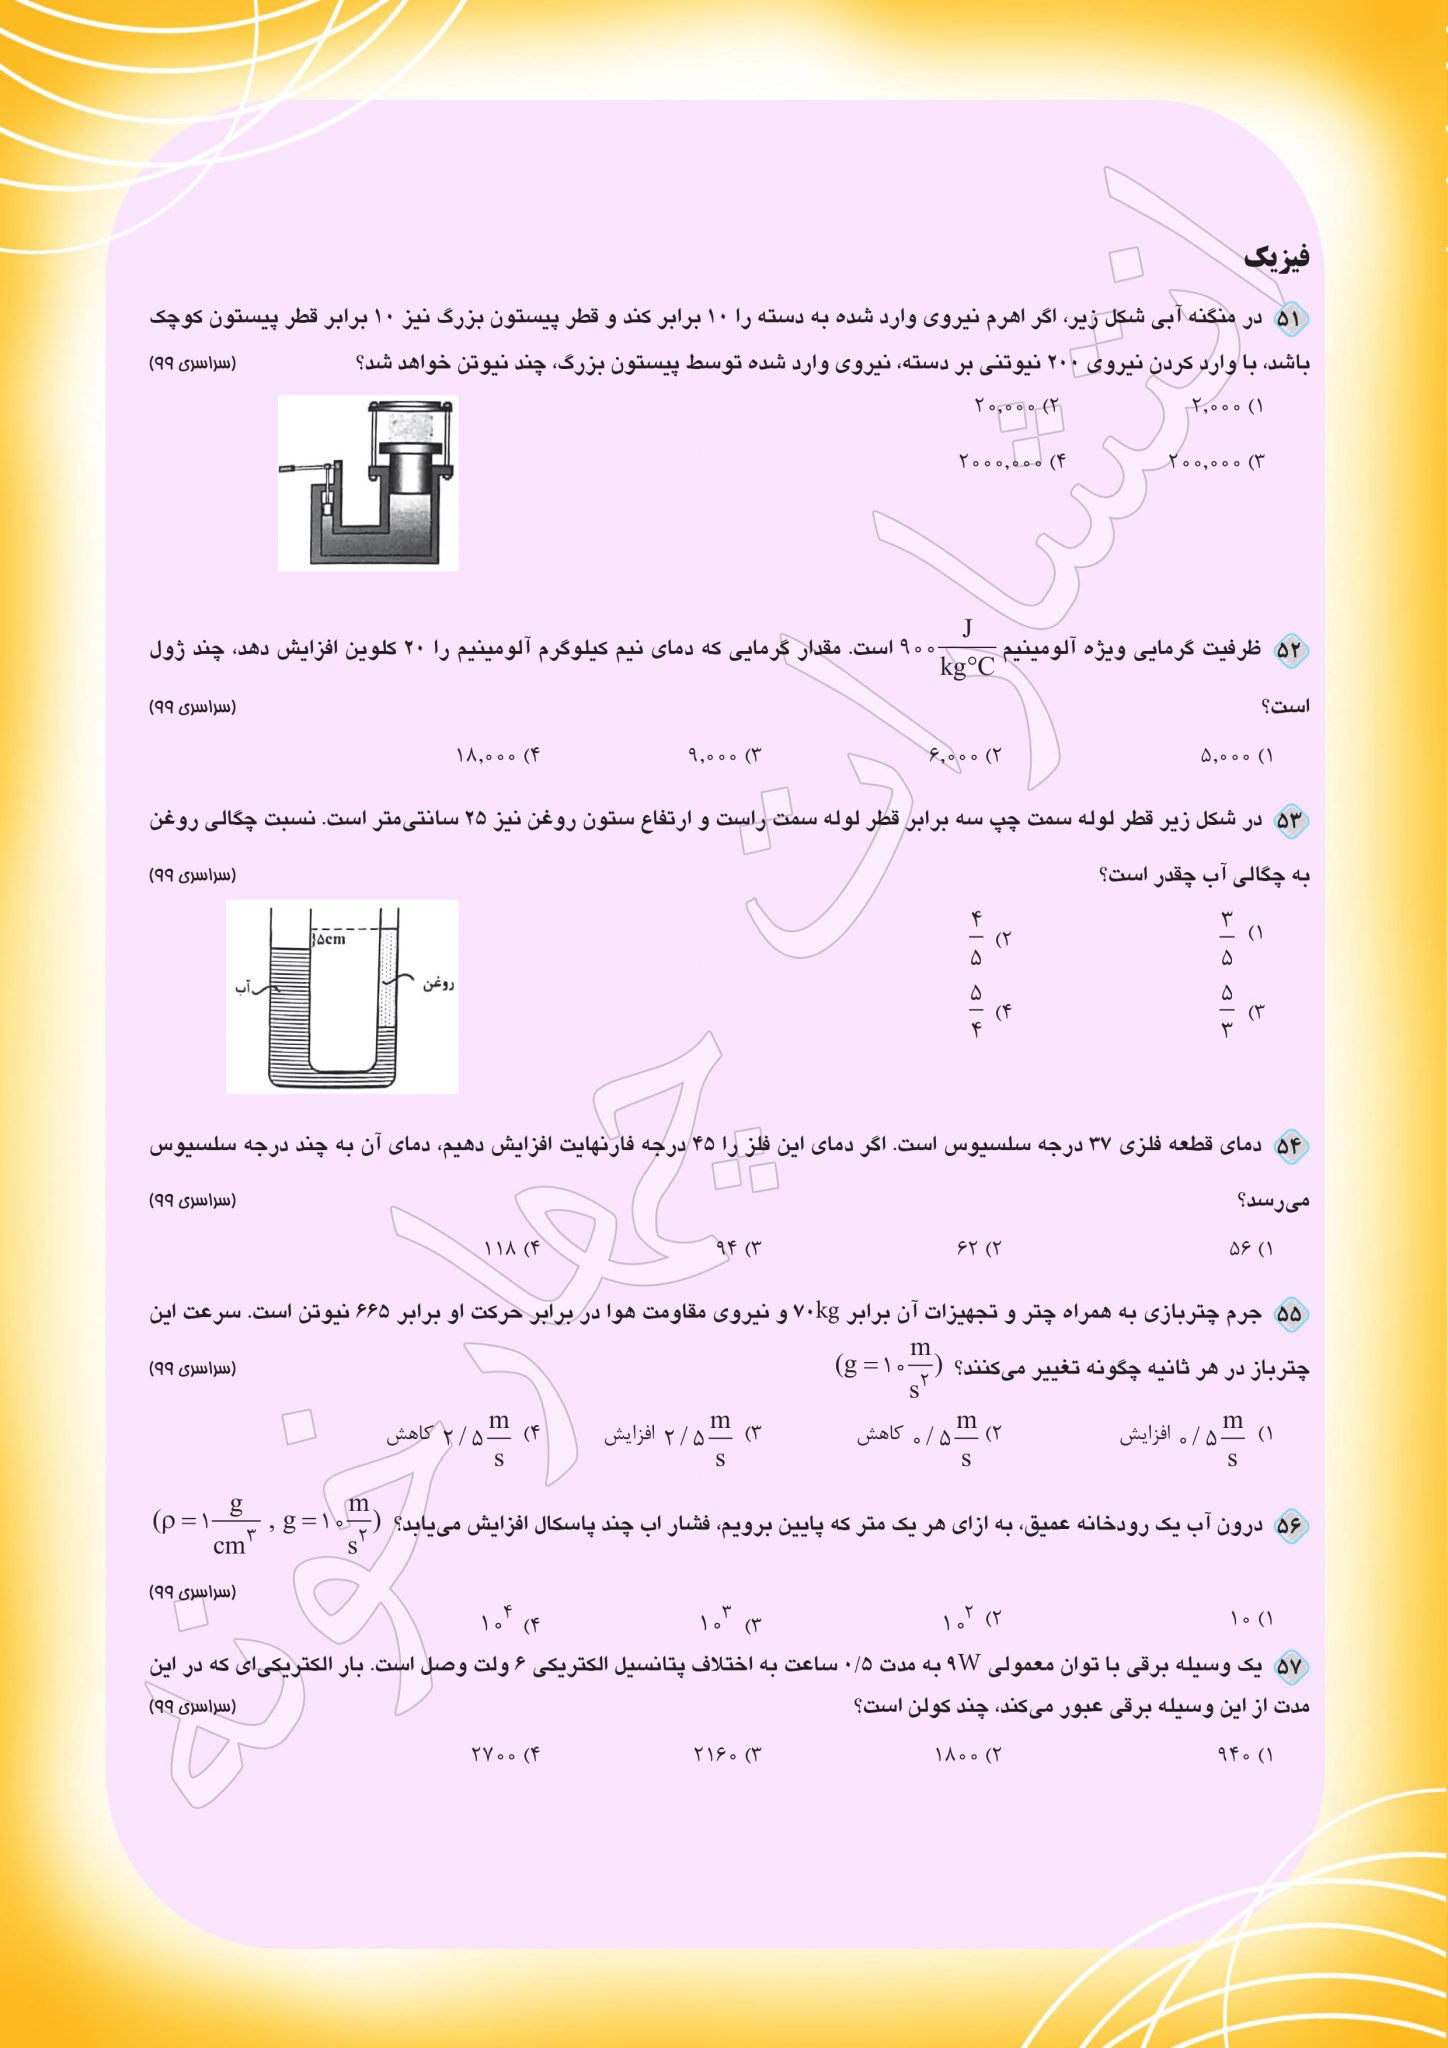 سوال فیزیک کنکور